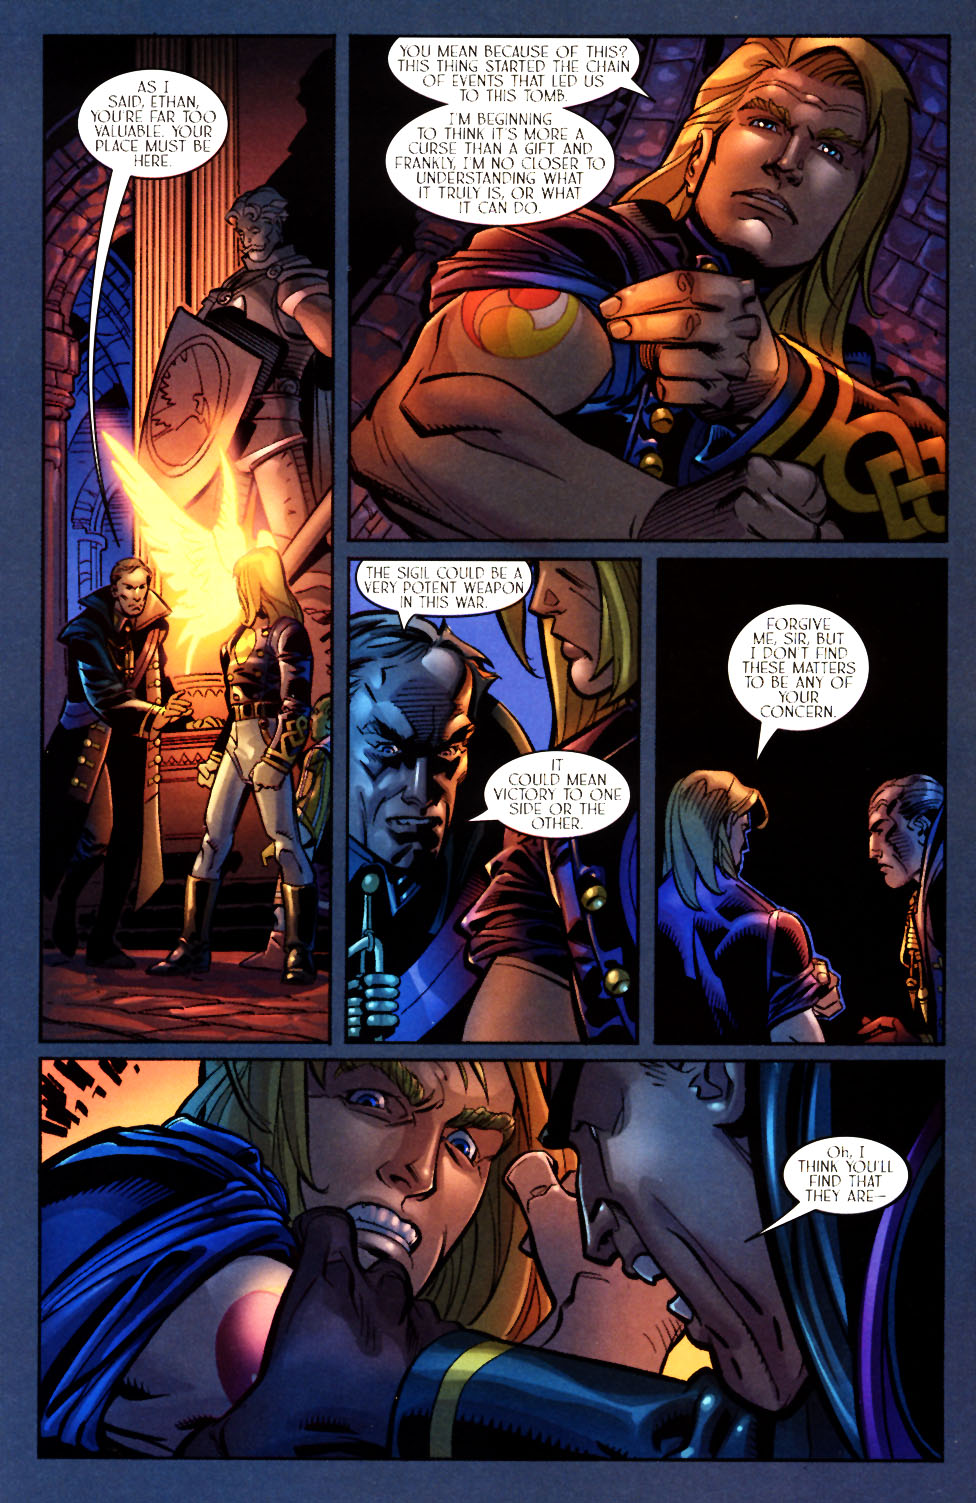 Read online Scion comic -  Issue #7 - 16